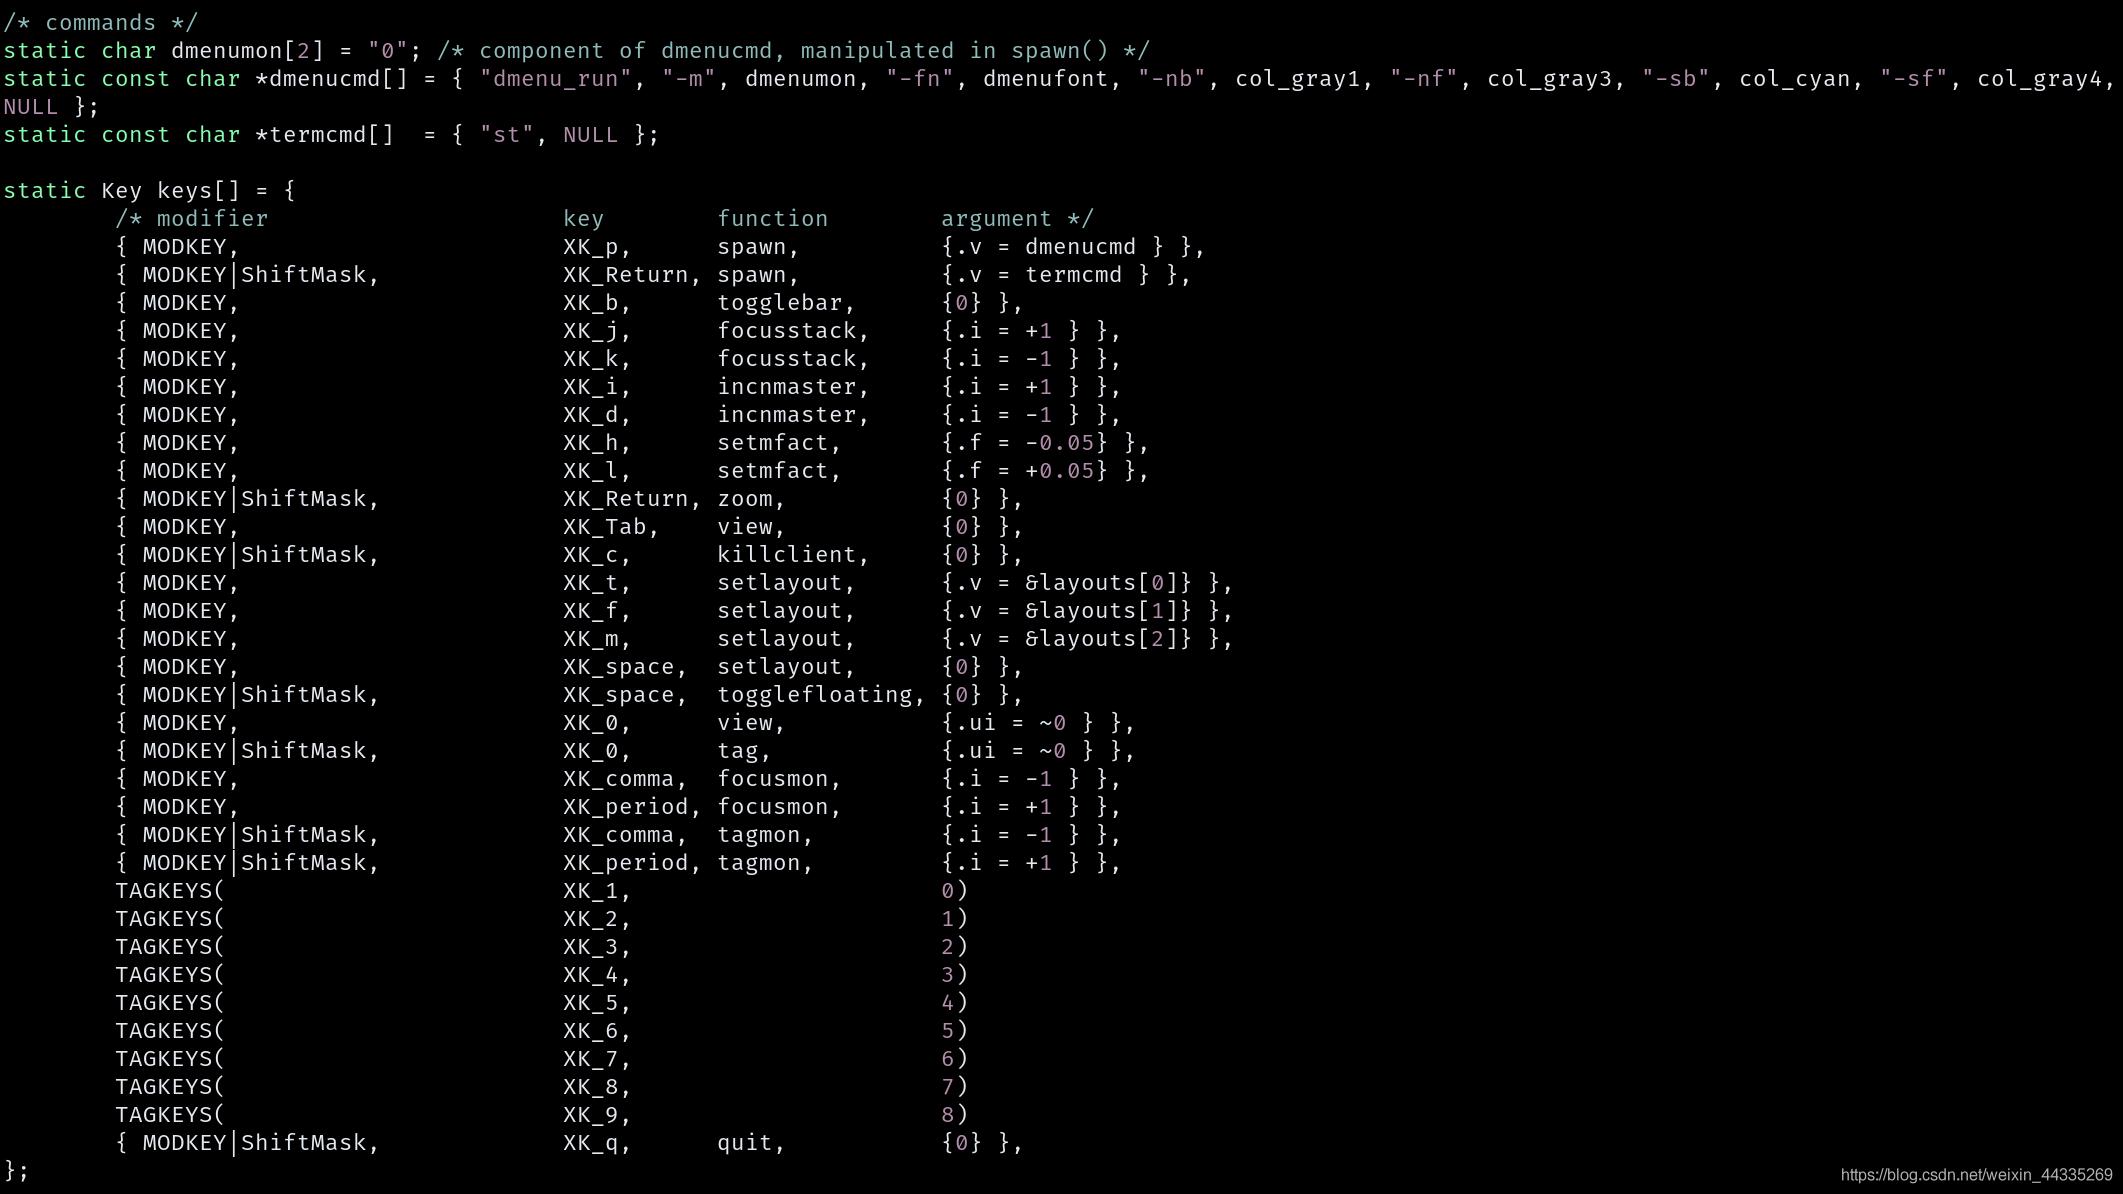 dwm-commands-key